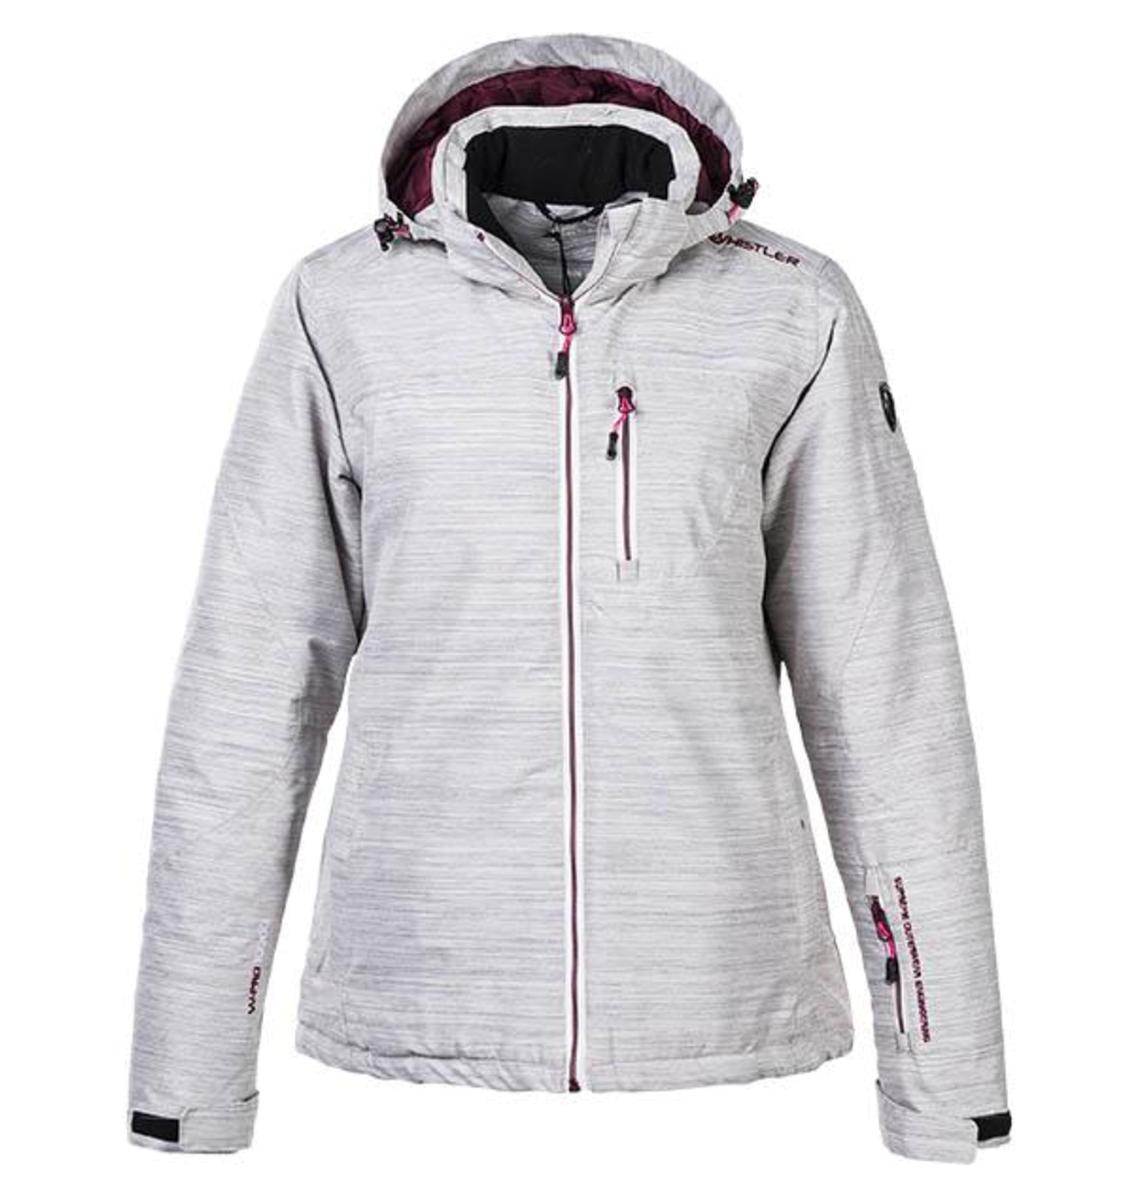 482de500 Whistler Kalgoorlie W ski jacket W-PRO 10000 Pearl Grey- Nava Sport ...